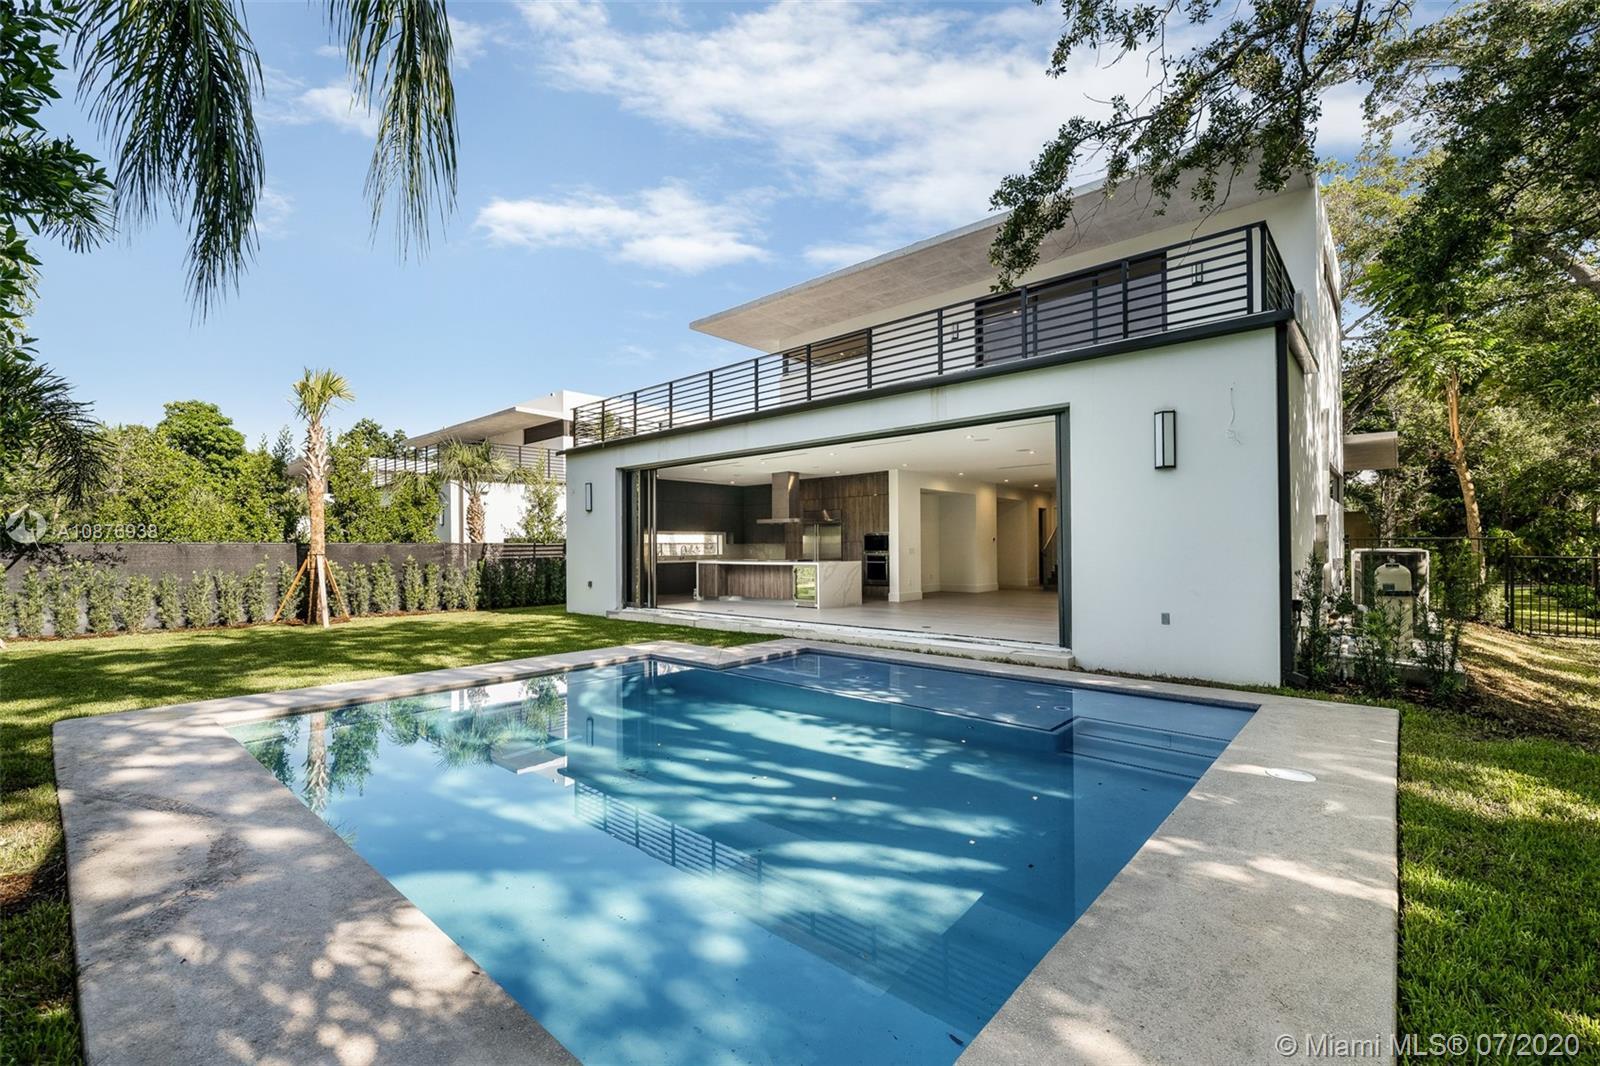 Palm Miami Heights # - 20 - photo